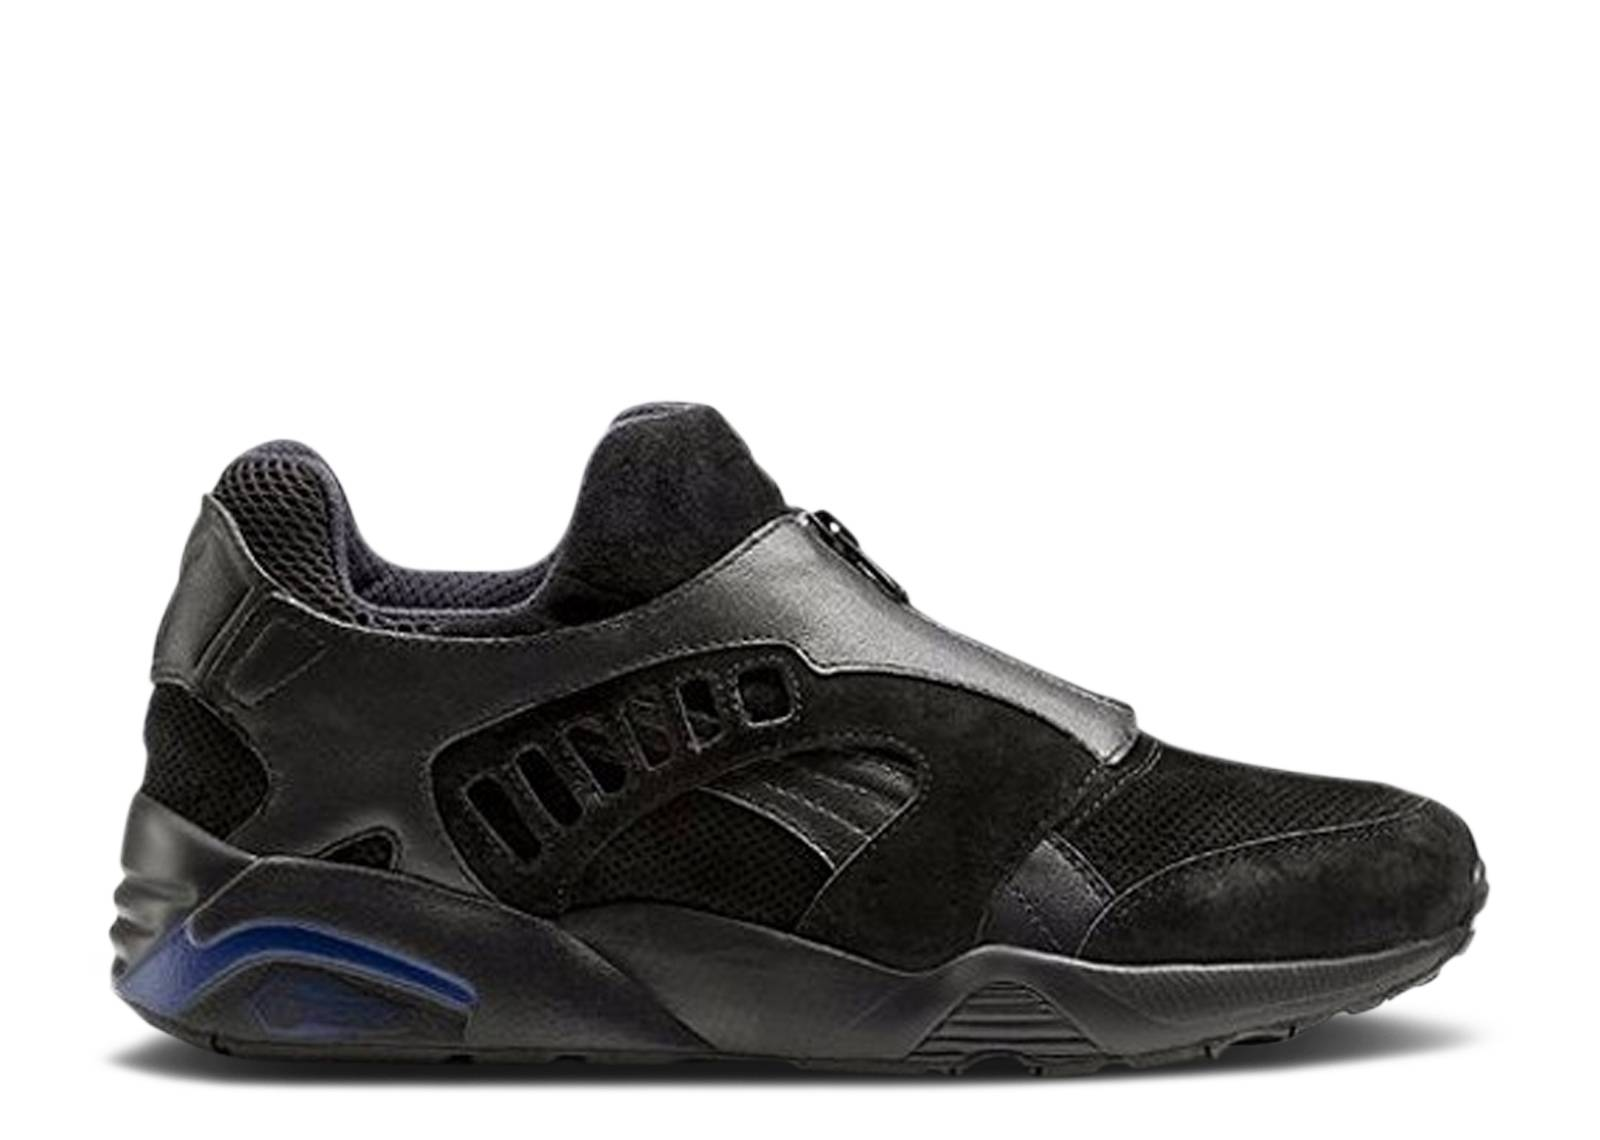 online store fb282 3f87c Puma Sneakers - Rihanna Fenty, Creepers, Slides | Flight Club